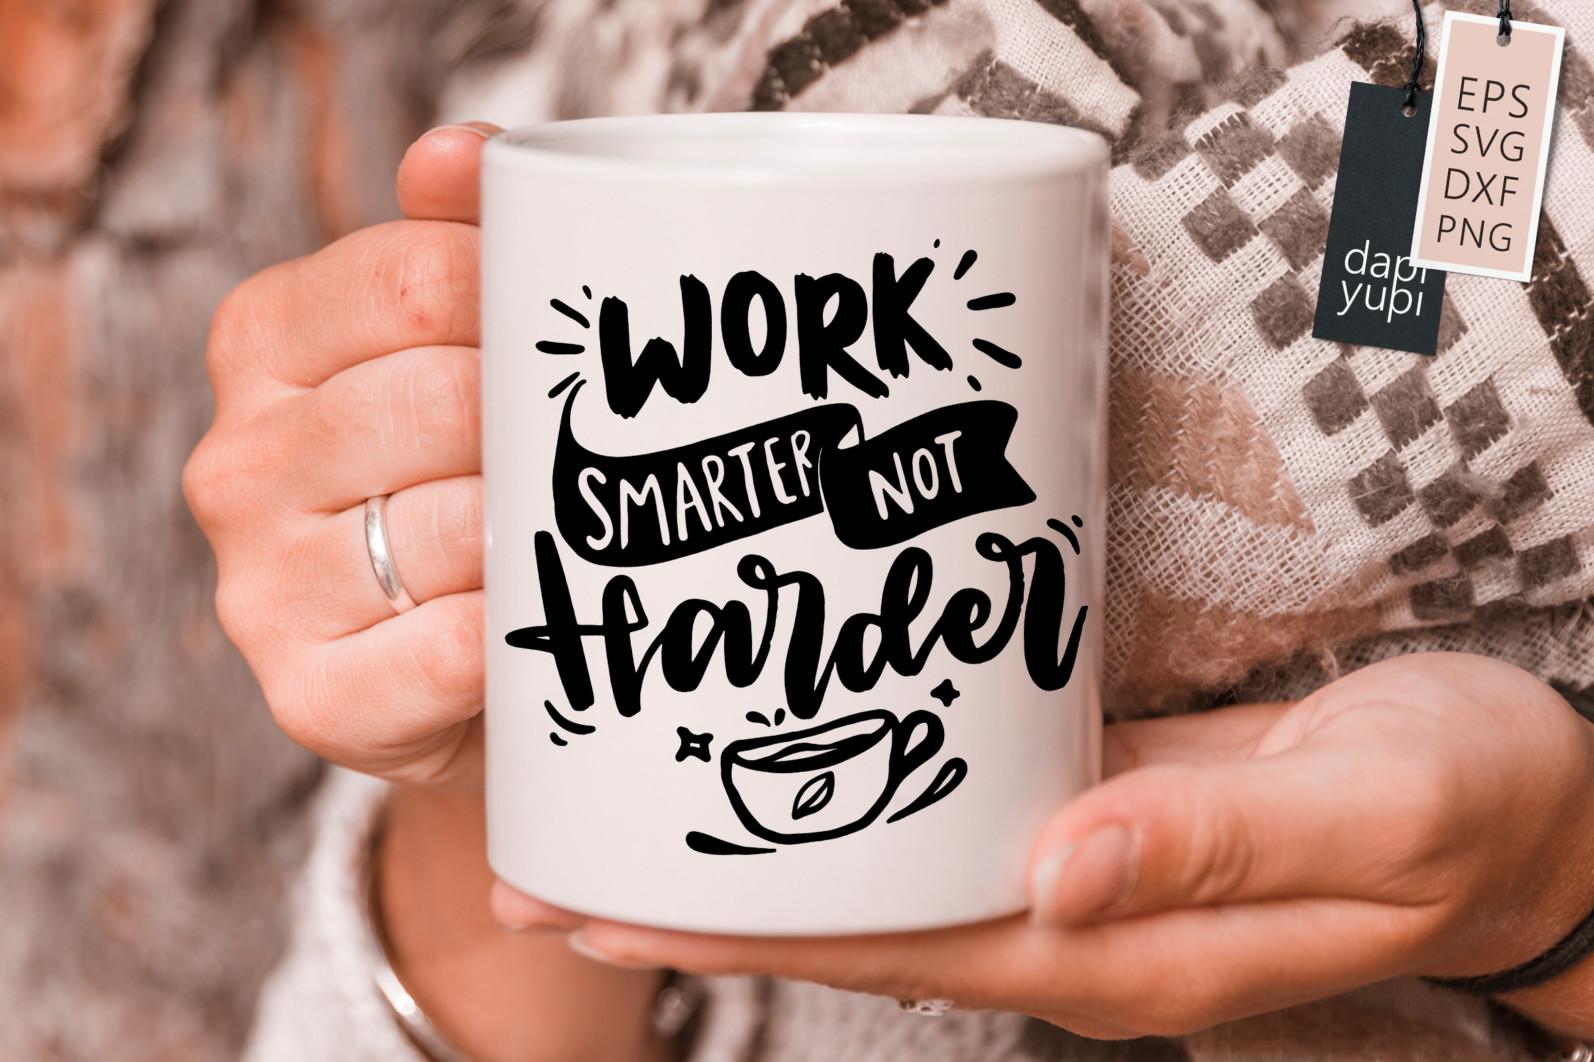 Inspirational Lettering Quotes SVG Work Smarter Not Harder - inspirational9s -